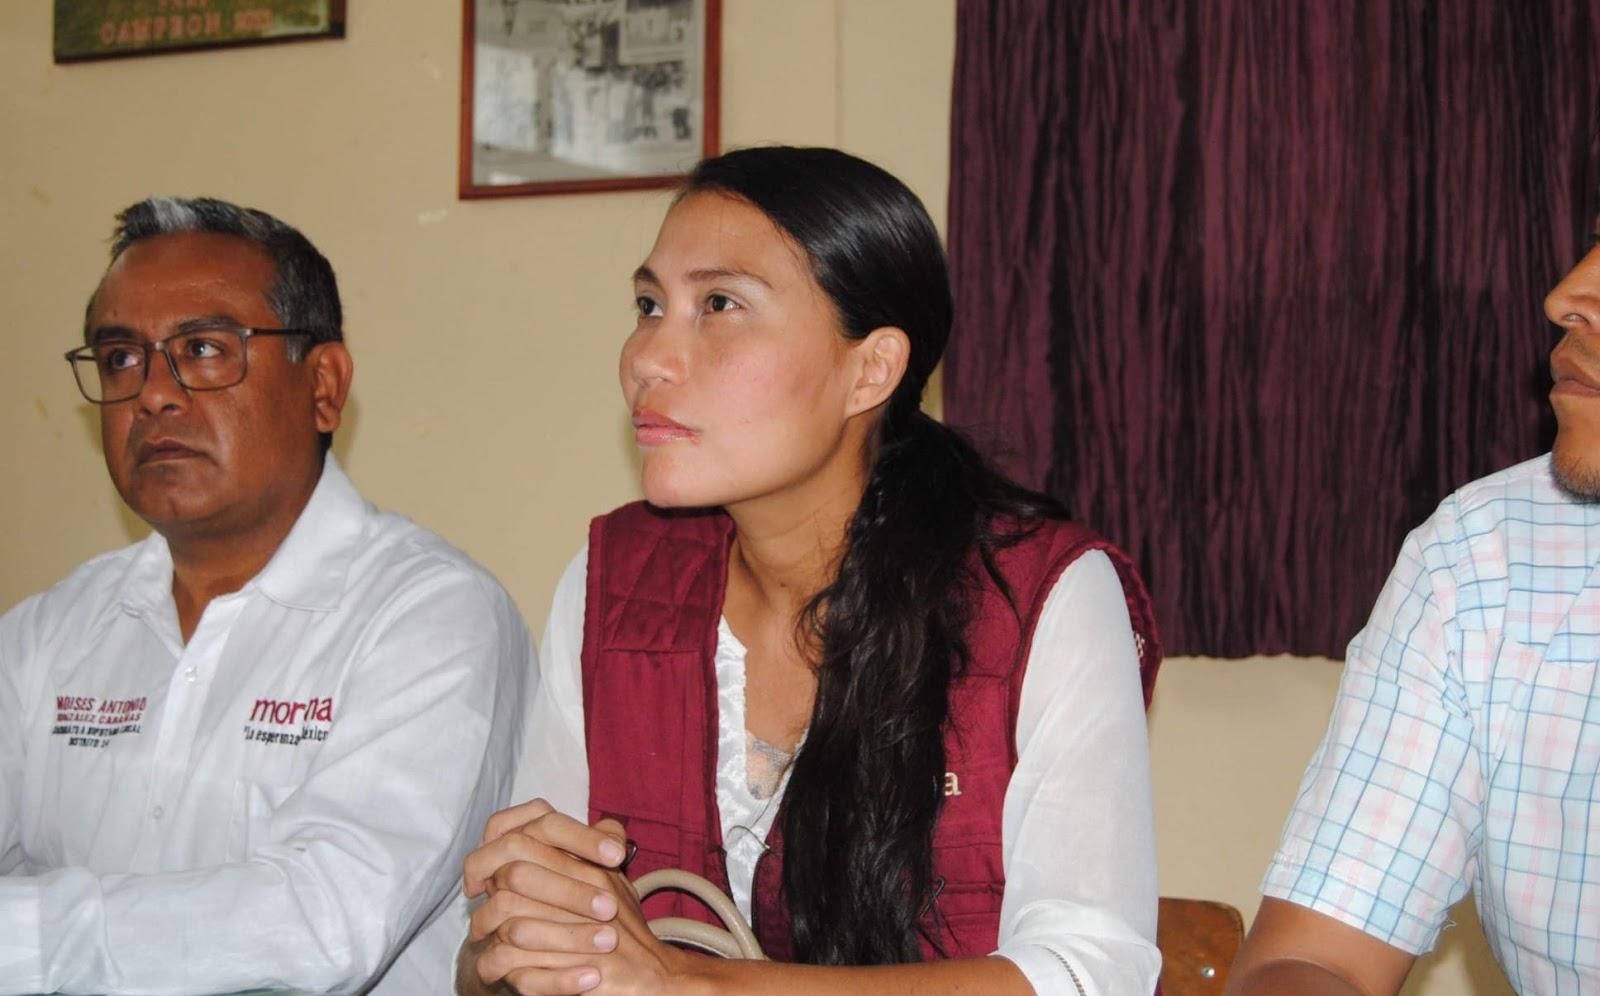 Grupo armado roba camioneta a candidata de Morena